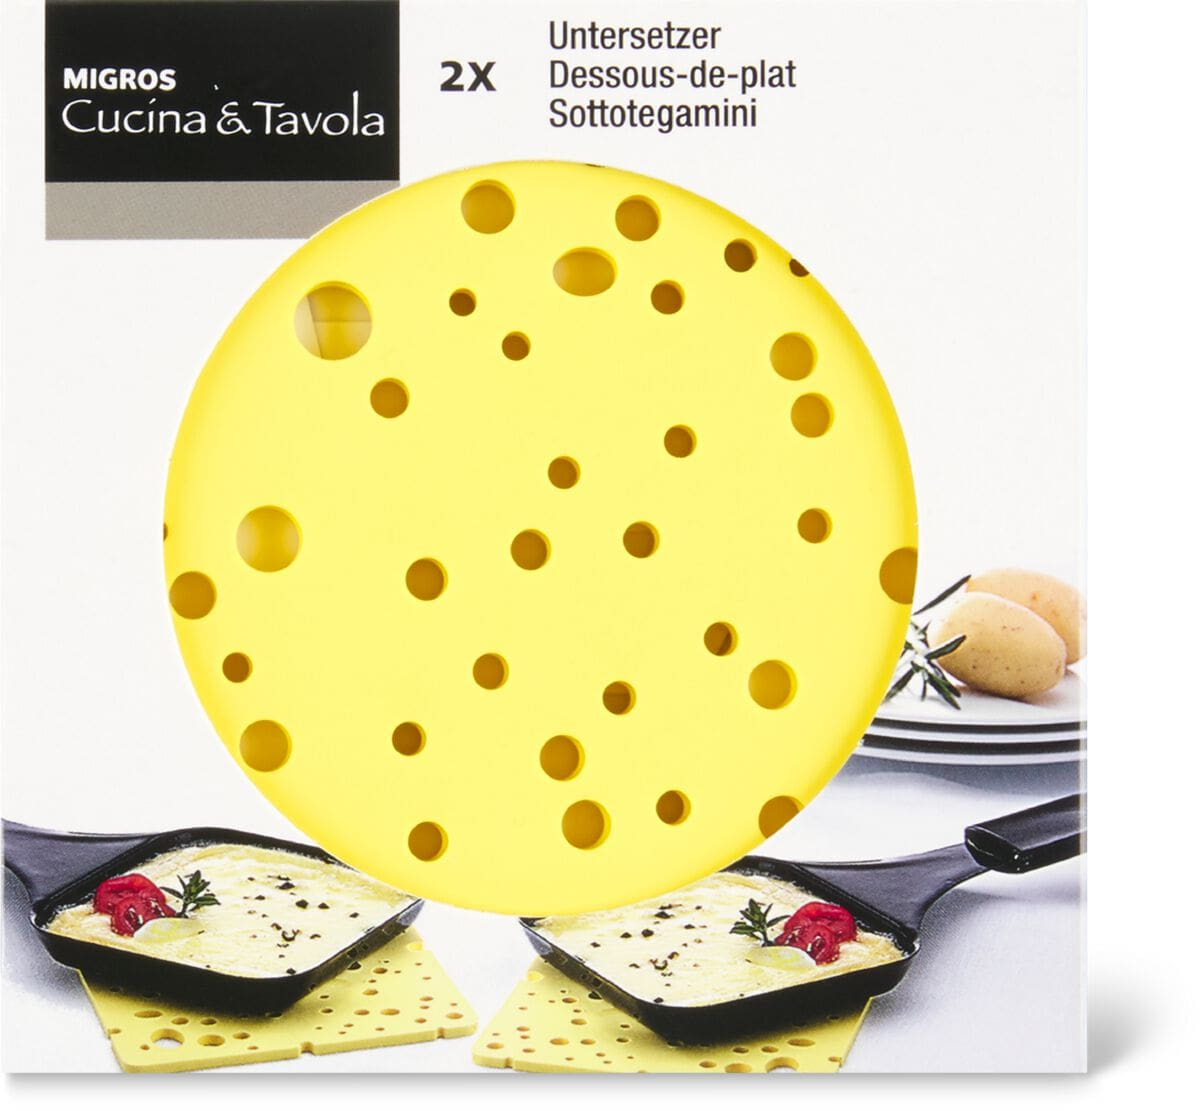 Cucina & Tavola Raclette-Untersetzer, 2 Stück